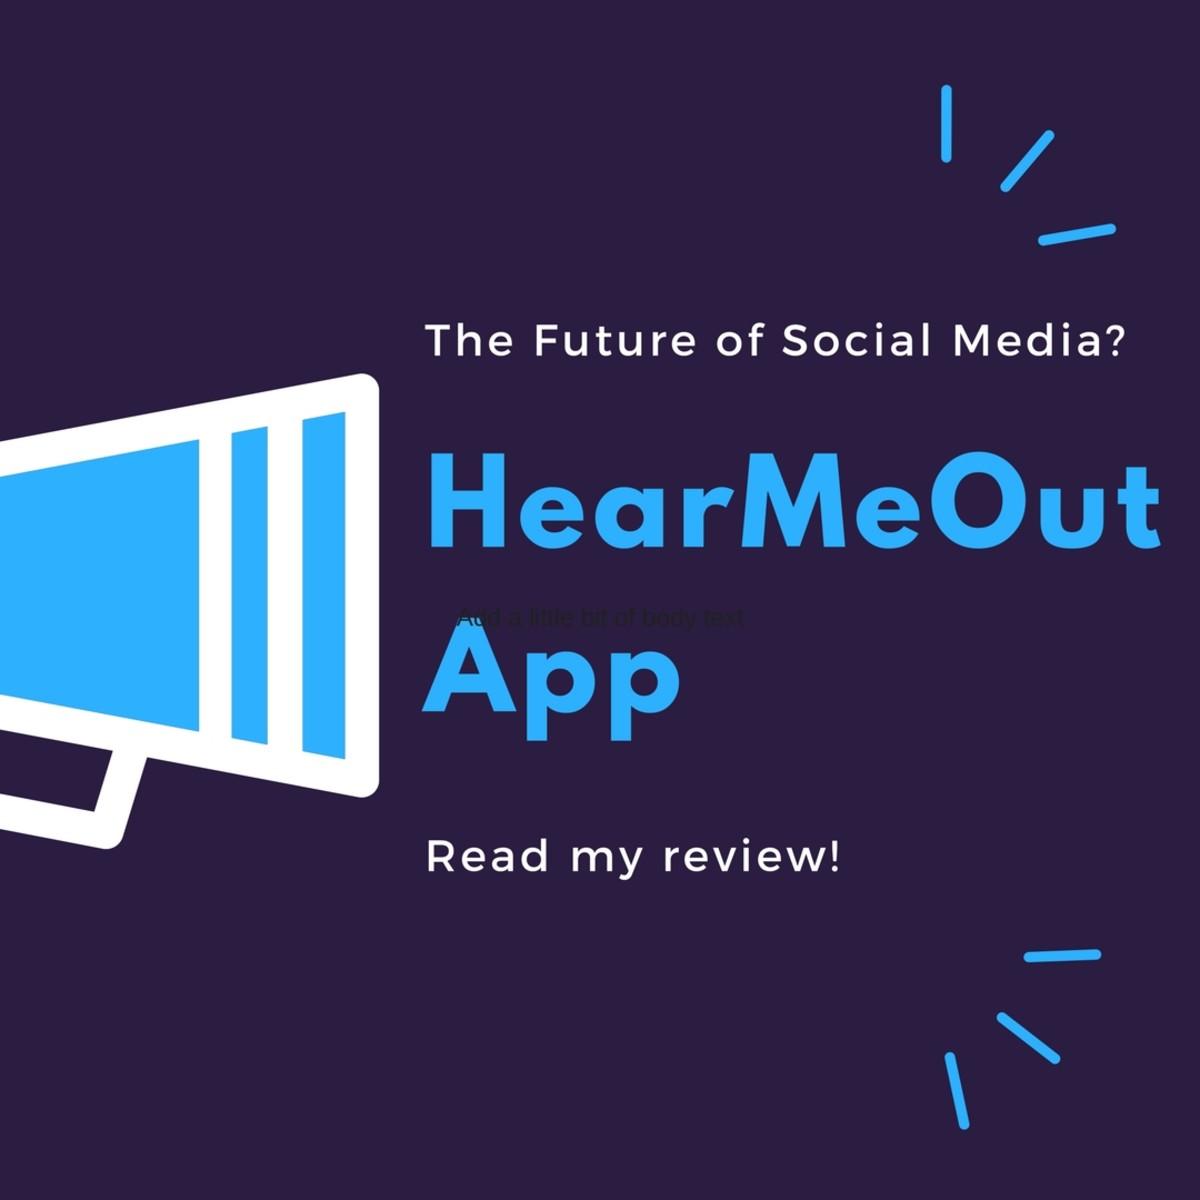 hearmeout-app-the-future-of-social-media